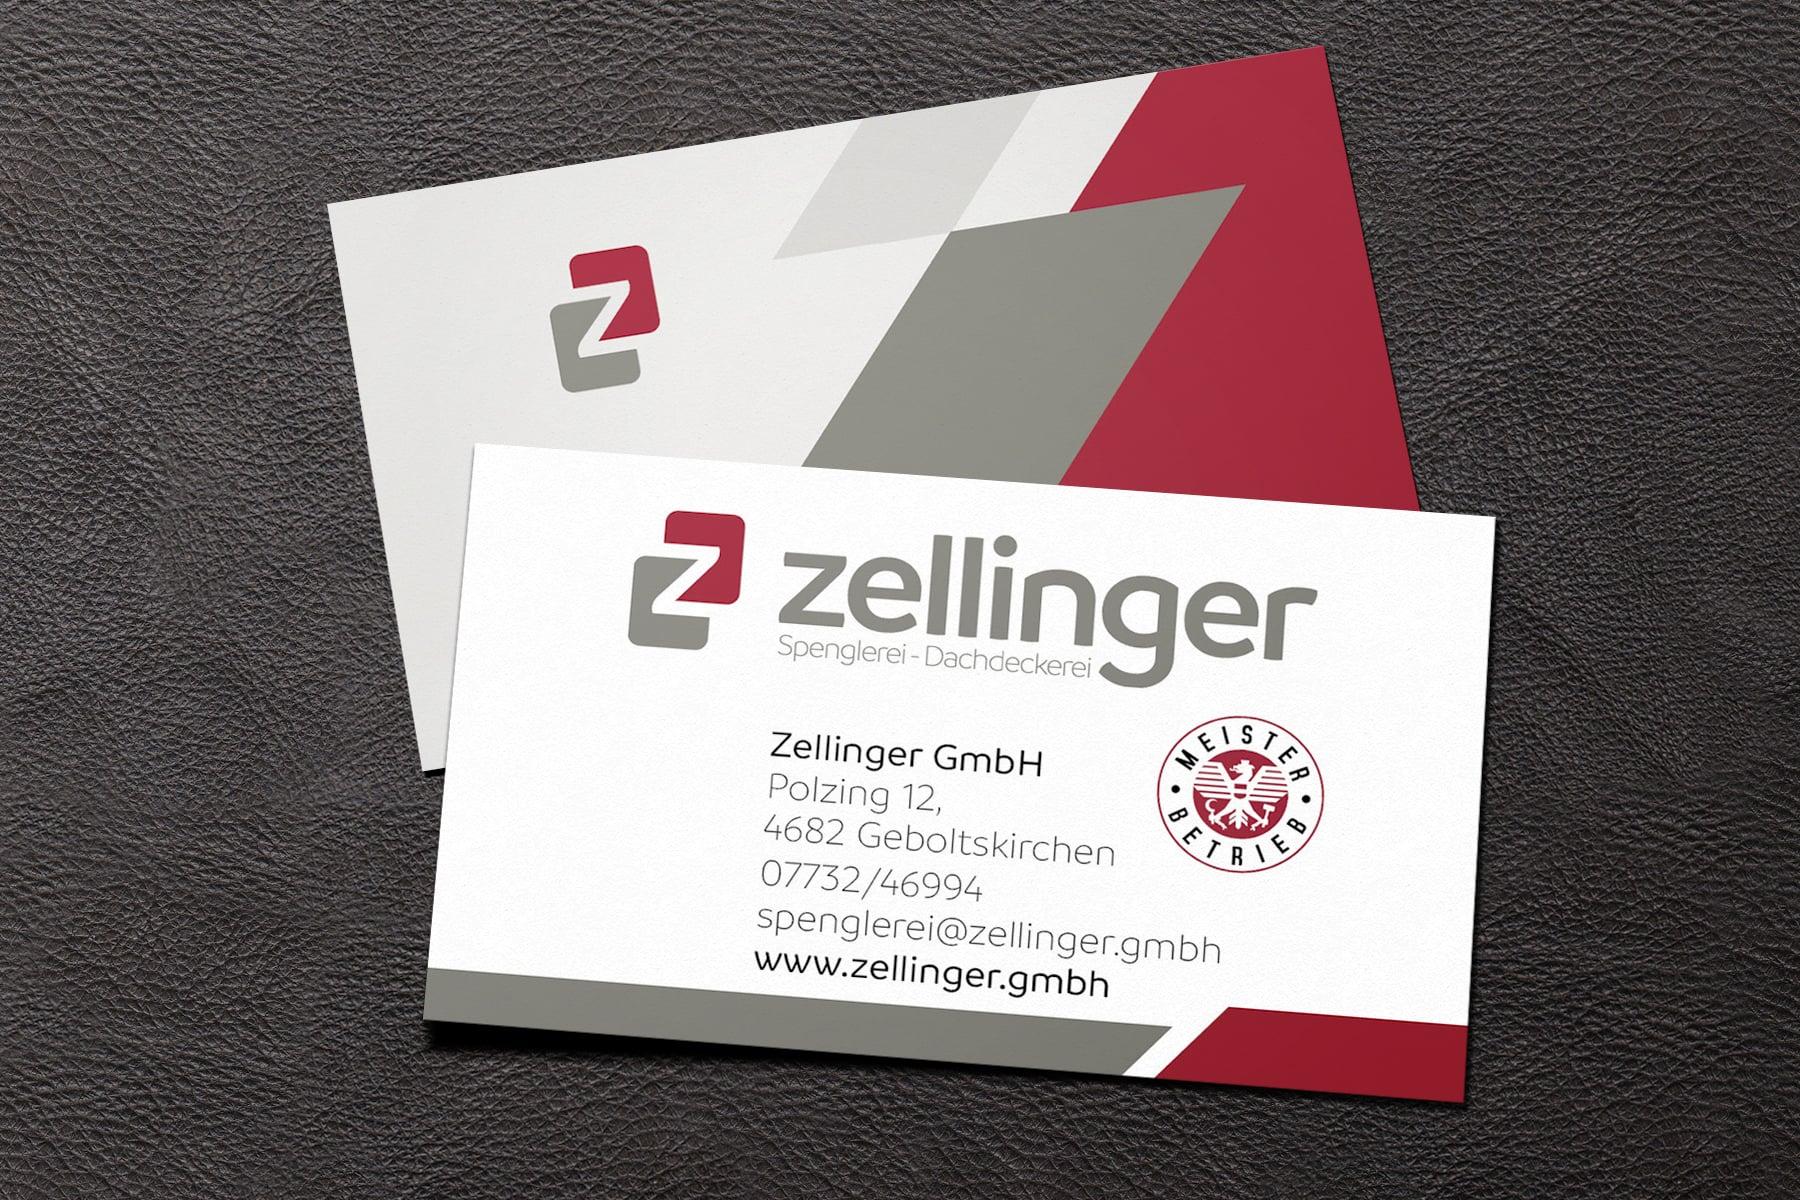 Zellinger GmbH | Spenglerei – Dachdeckerei